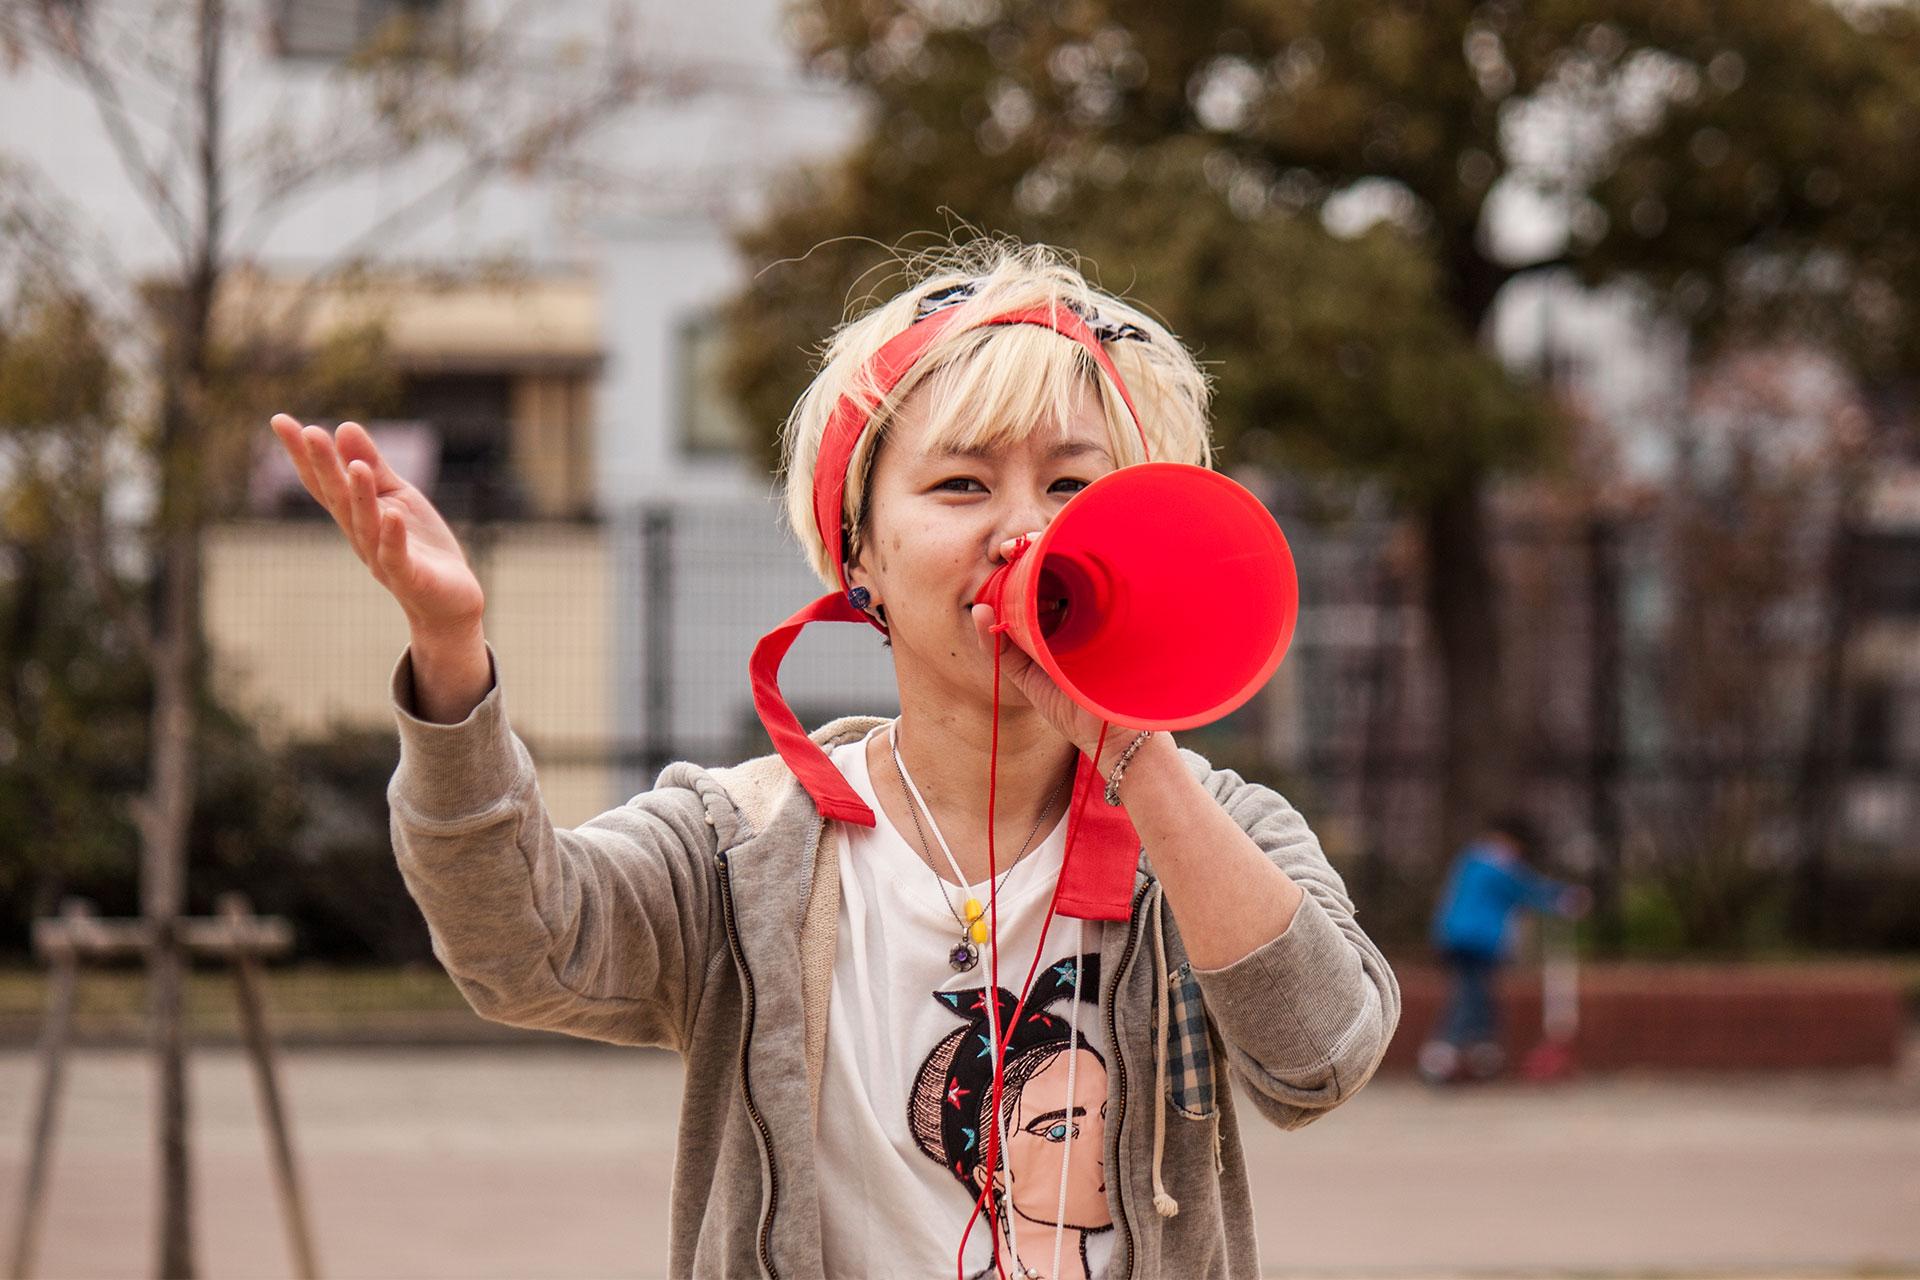 Mayumi eröffnet die Jubiläumsfeier